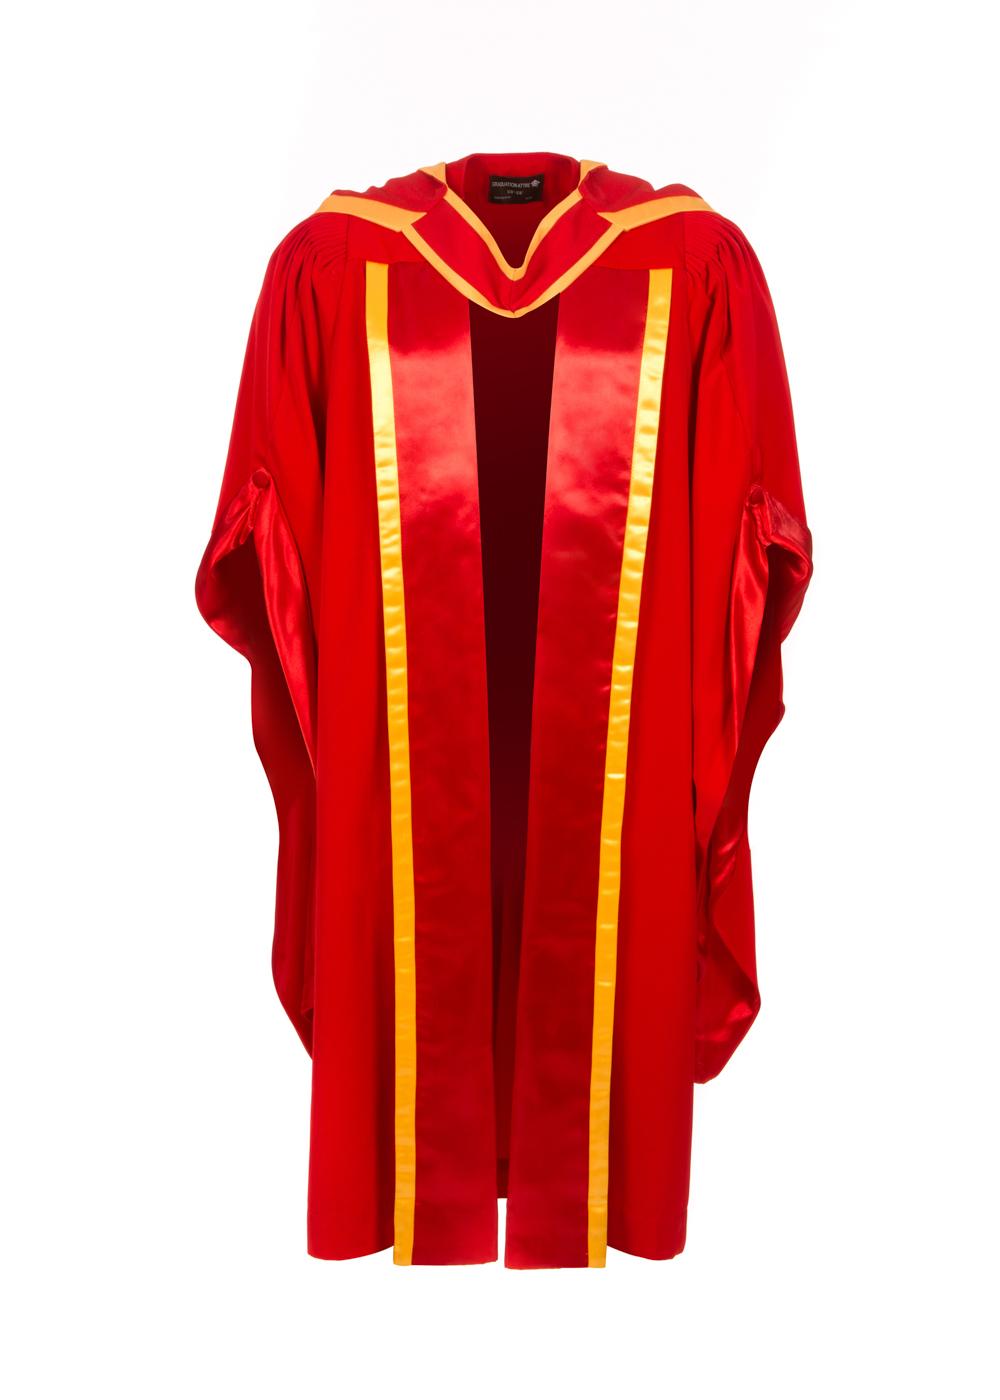 Doctoral Gown, Hood and Bonnet - Graduation Gowns | Graduation Attire